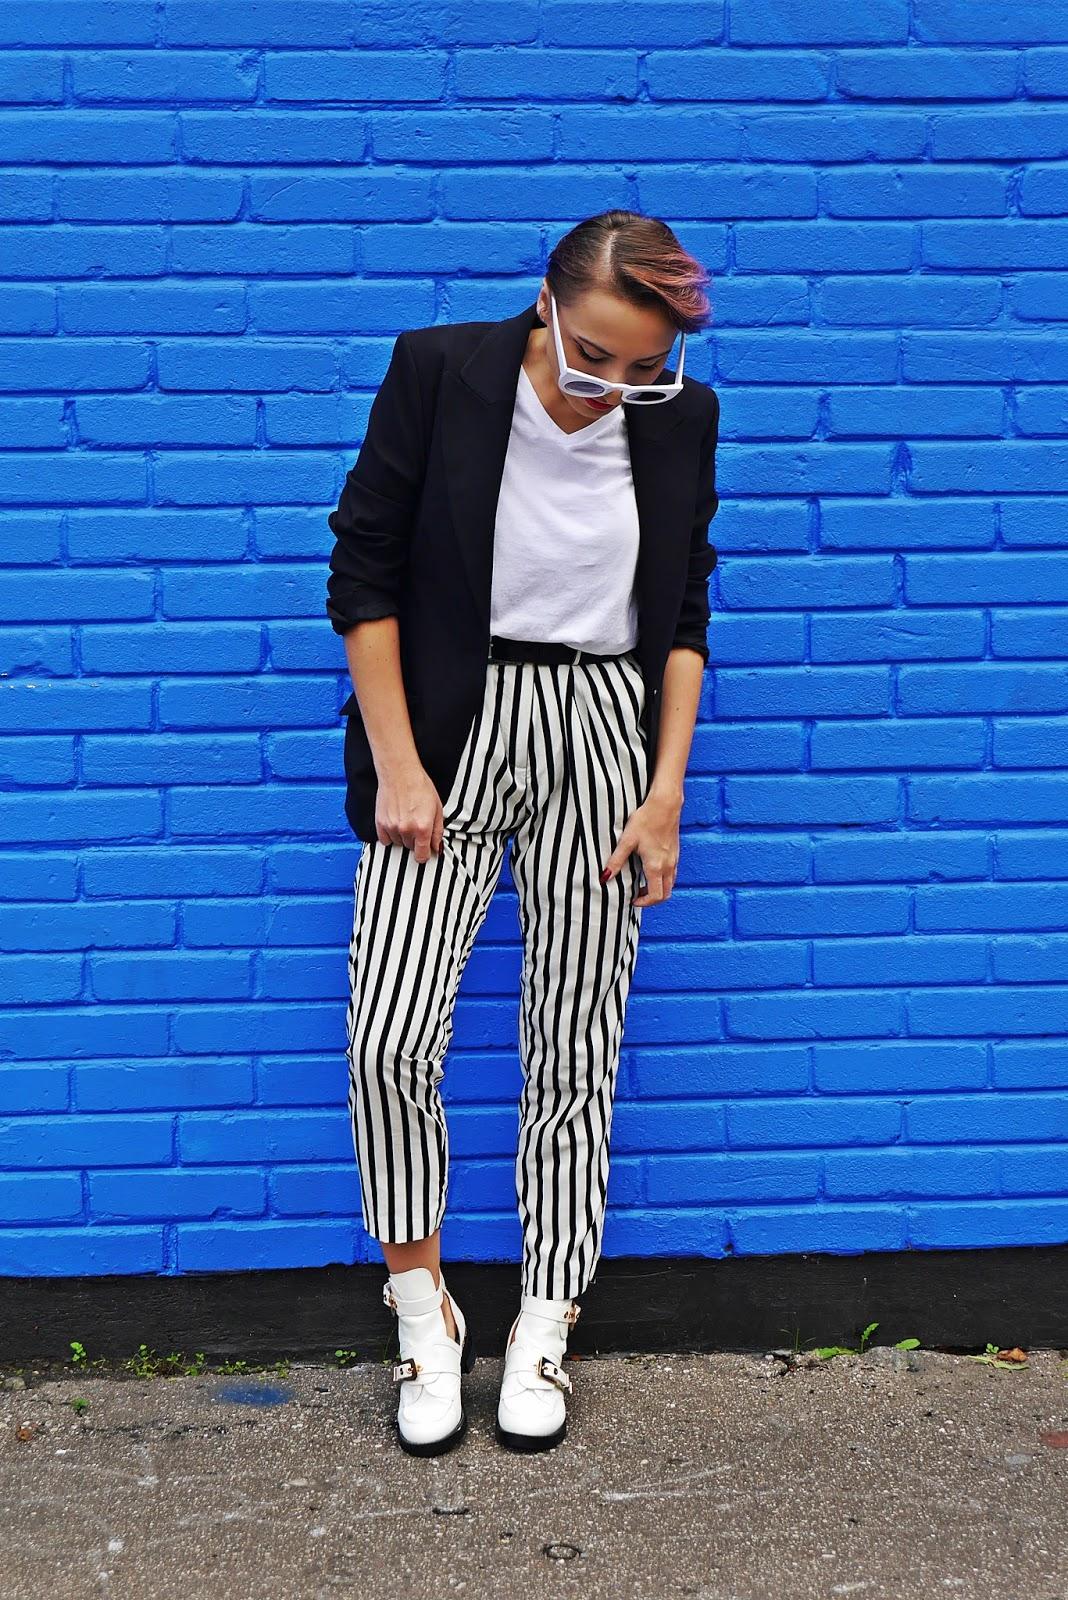 5_balenciaga_white_Ceinture_Ankle_Boots_stripes_pants_black_jacket_karyn_blog_modowy_280917